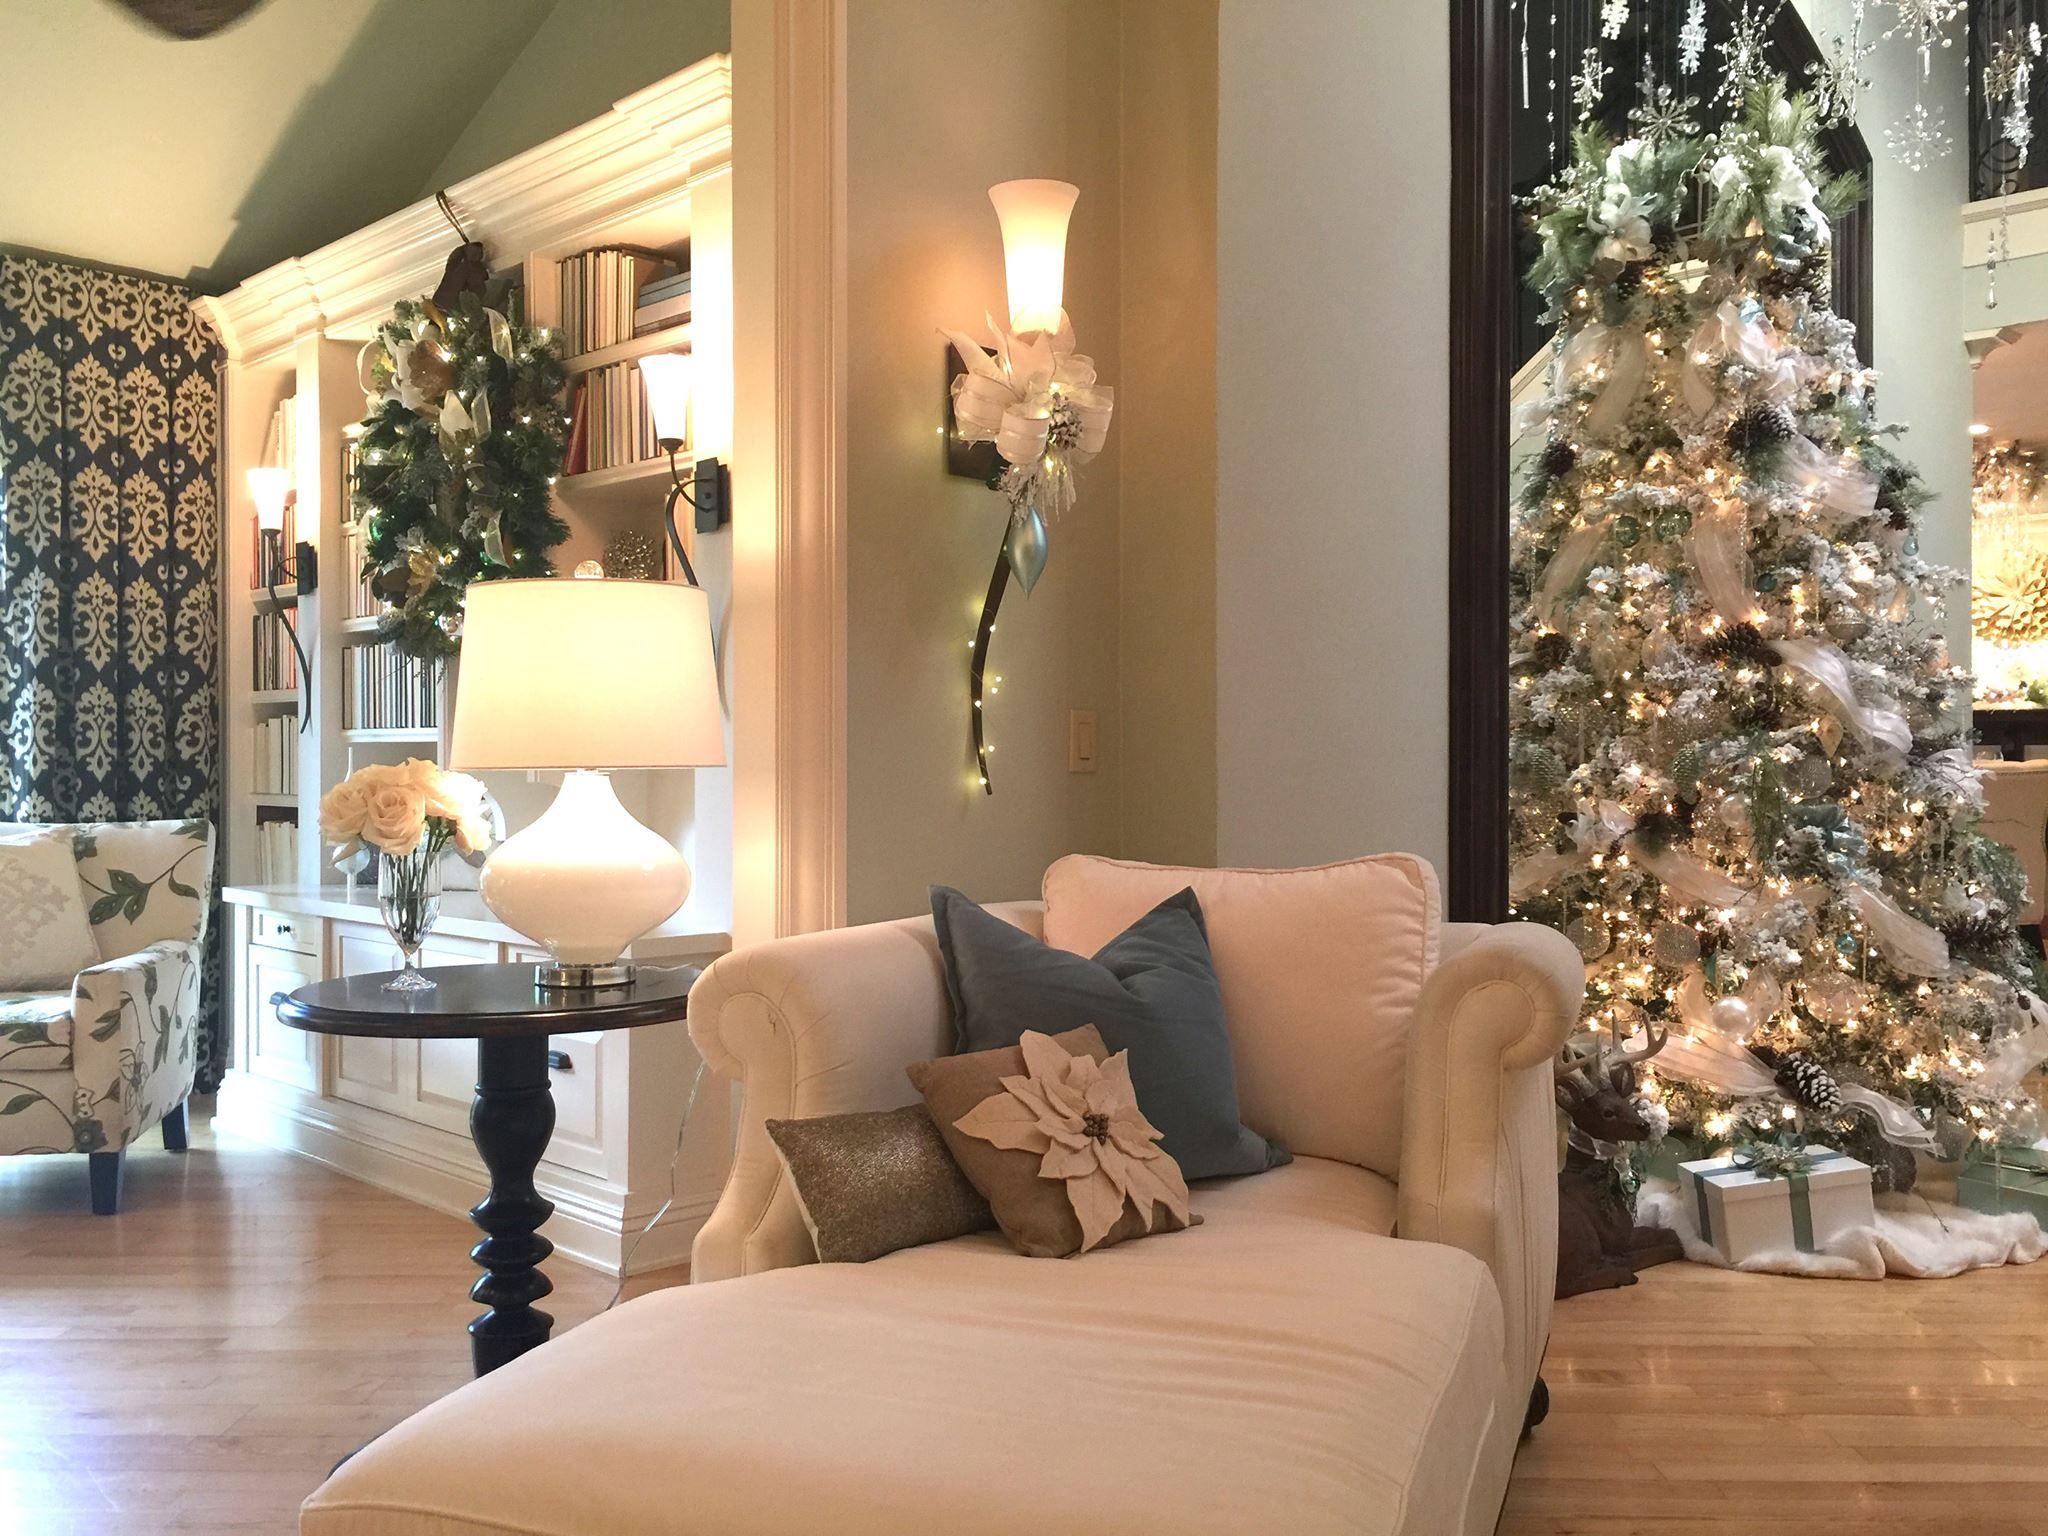 GORGEOUS Christmas decorating Rebecca Robeson MoreBest 25  Rebecca robeson ideas on Pinterest   Conversation area  . Robeson Design Kitchen. Home Design Ideas